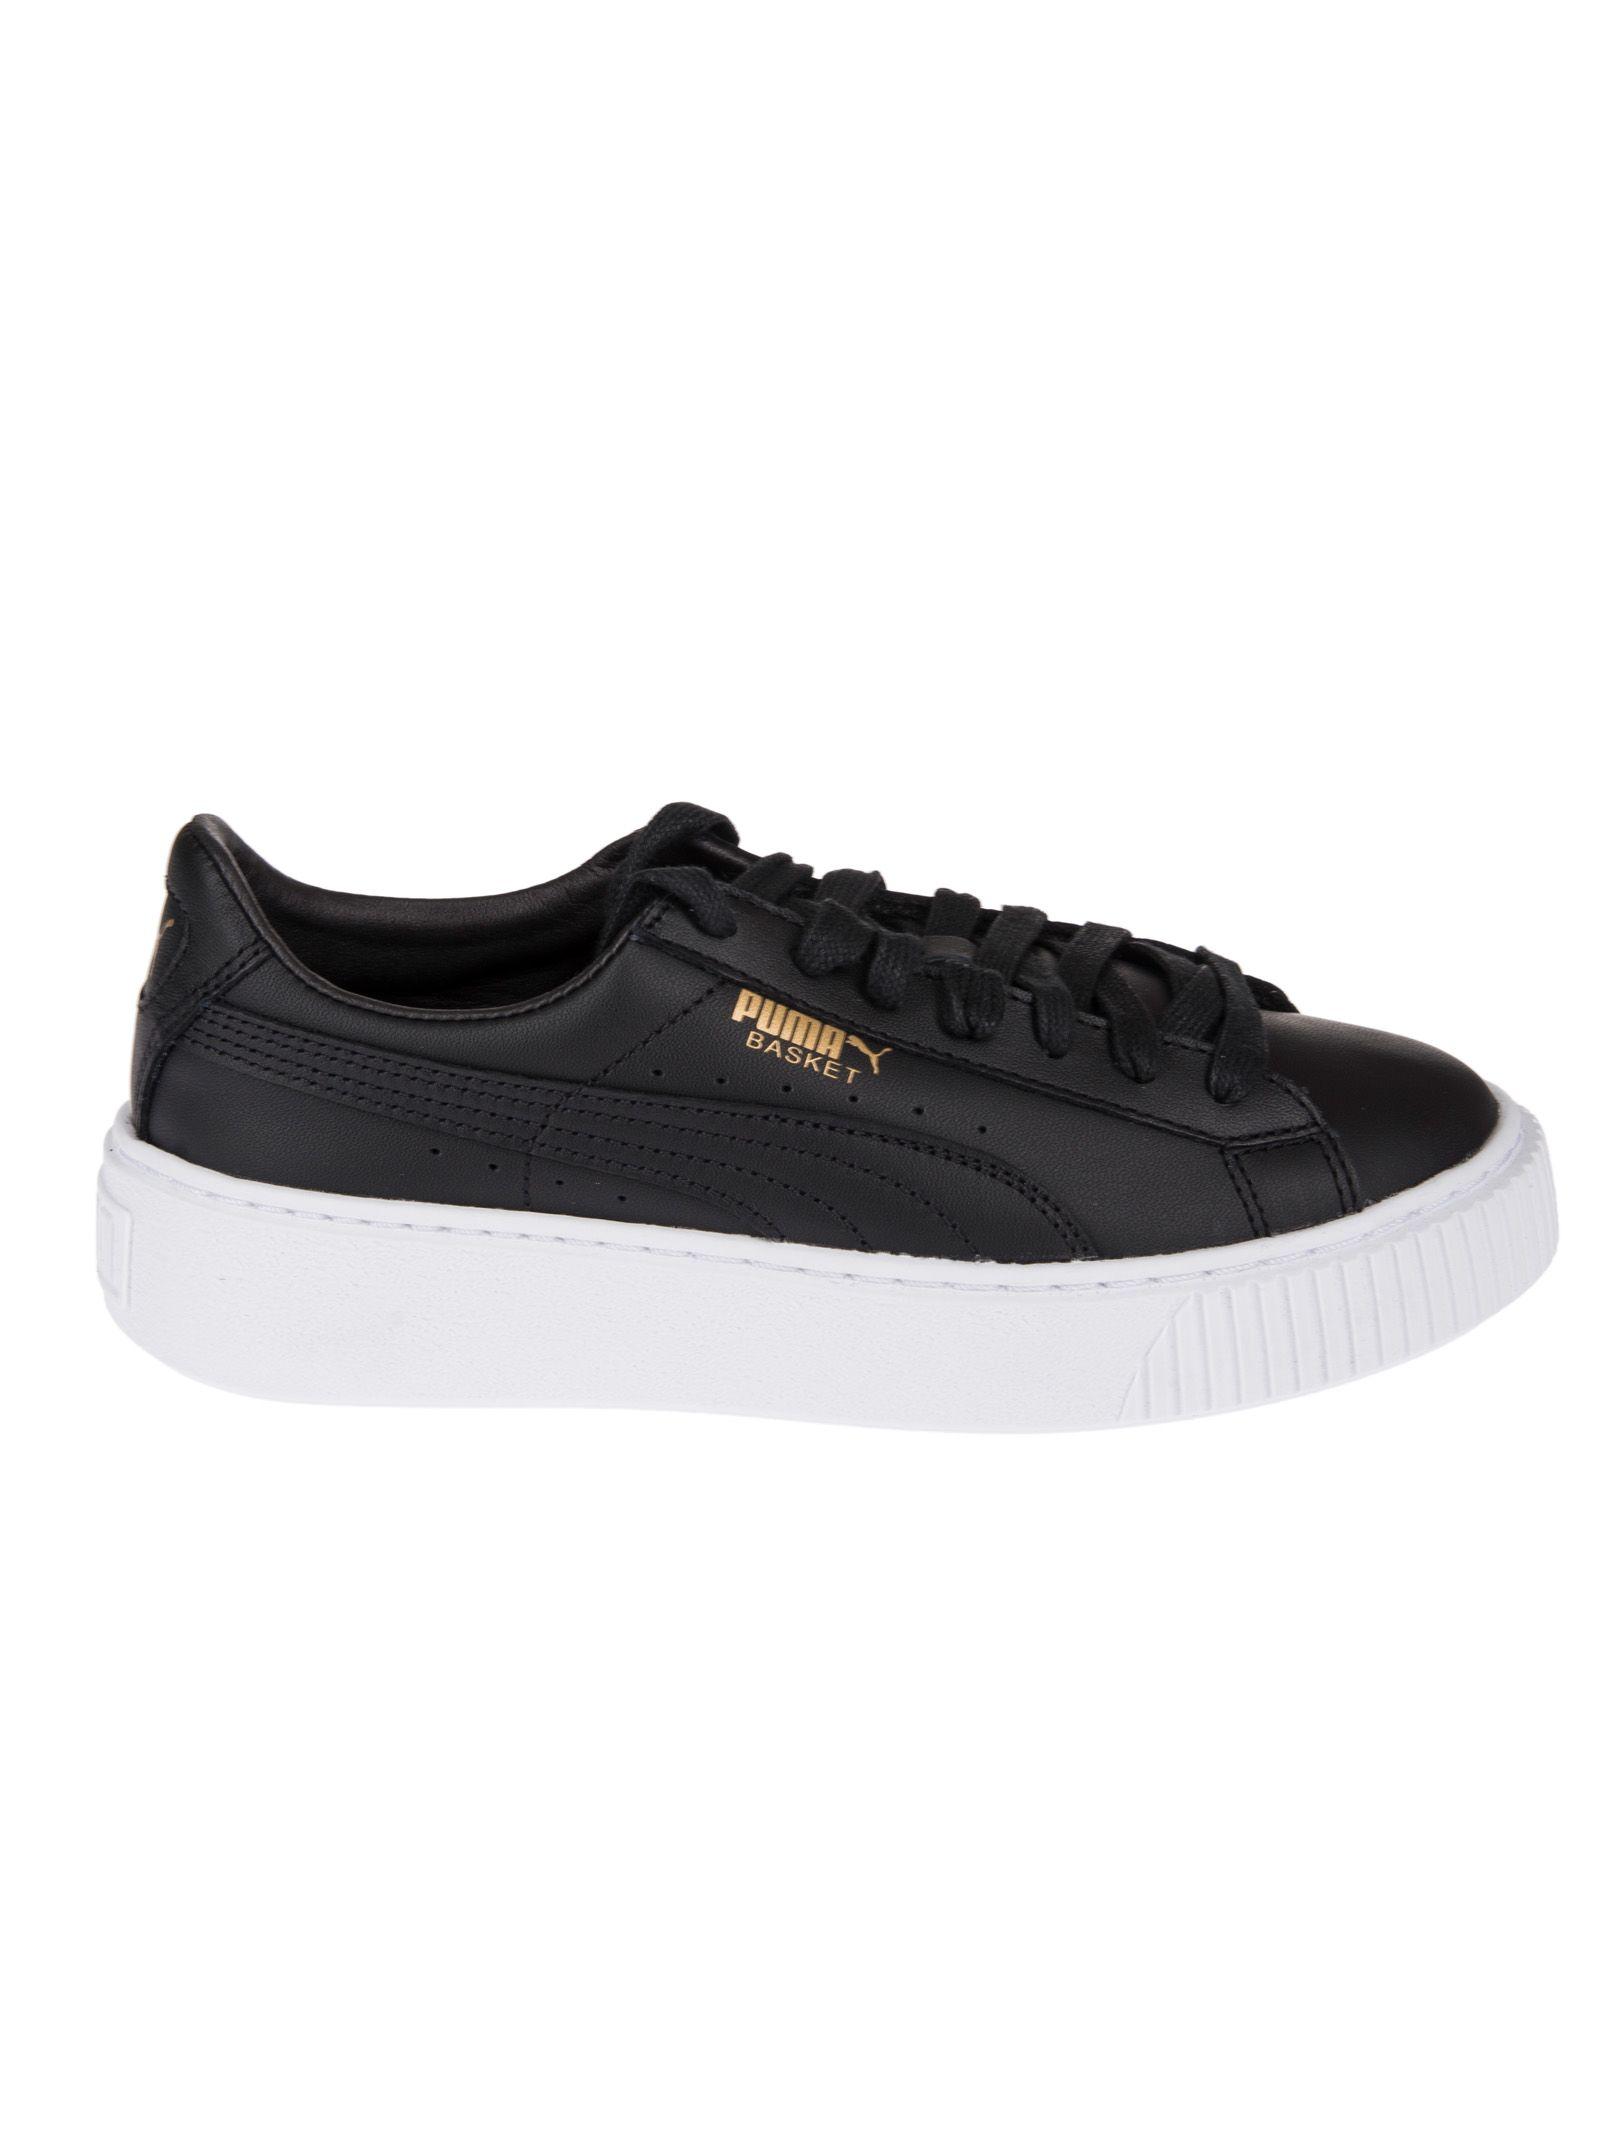 Puma Skate Sneakers